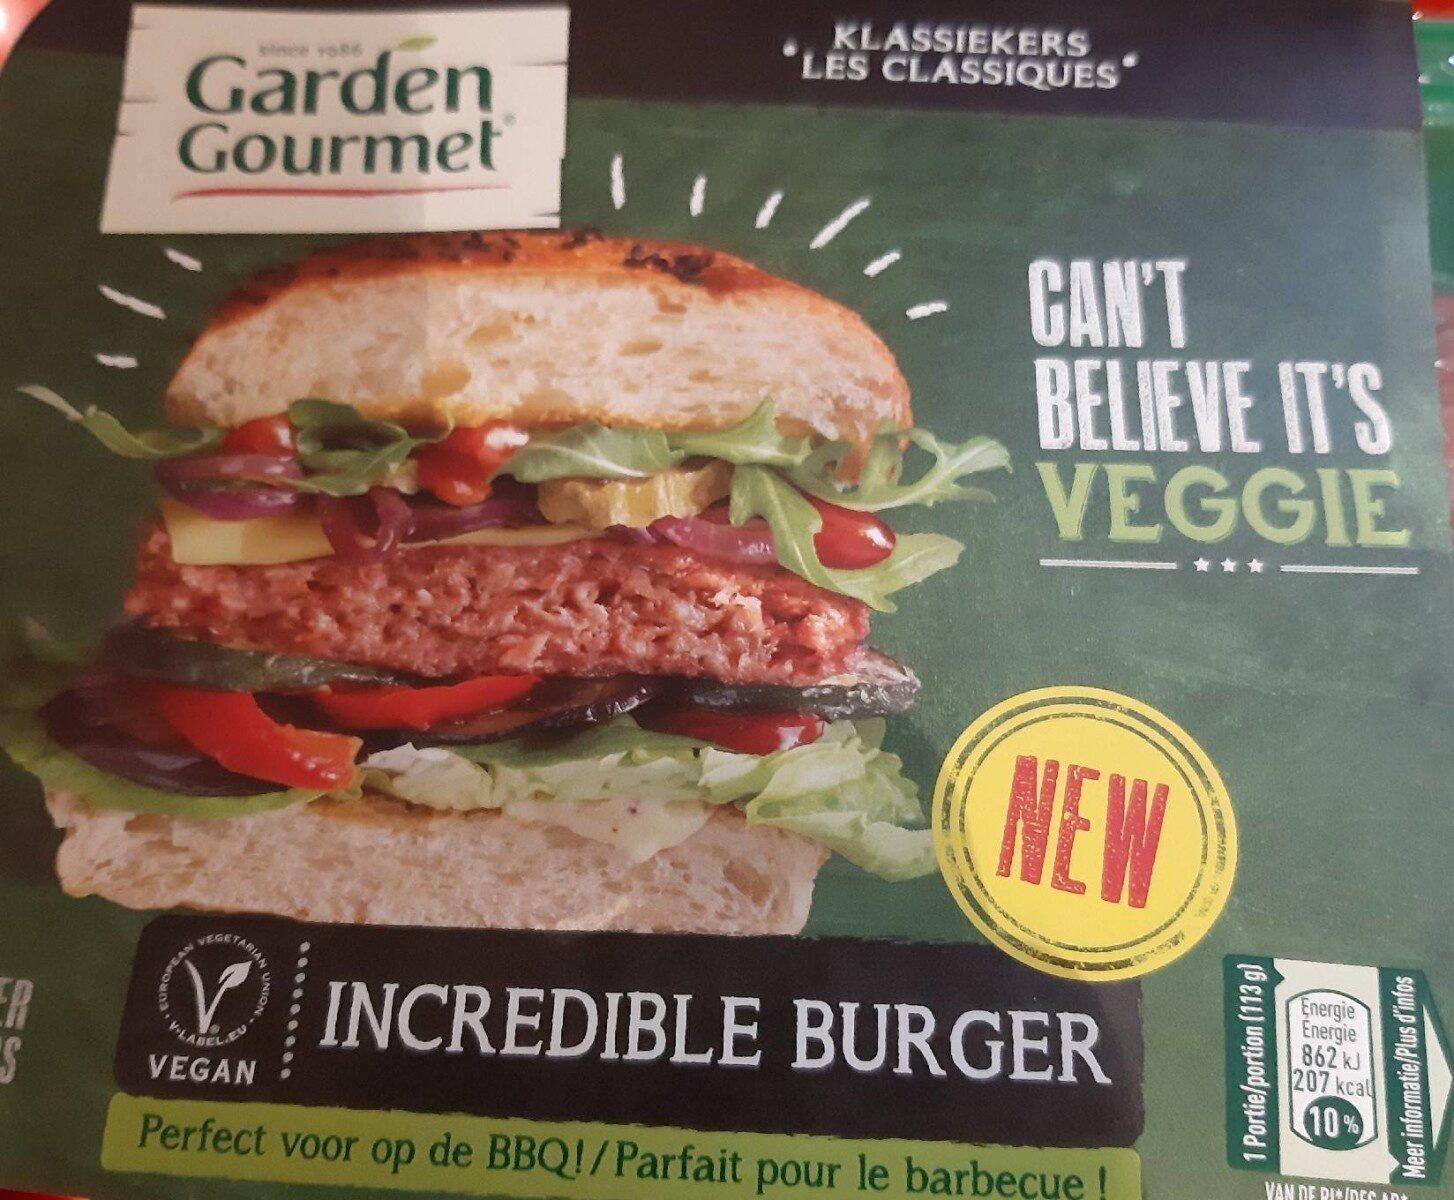 Incredible burger - Product